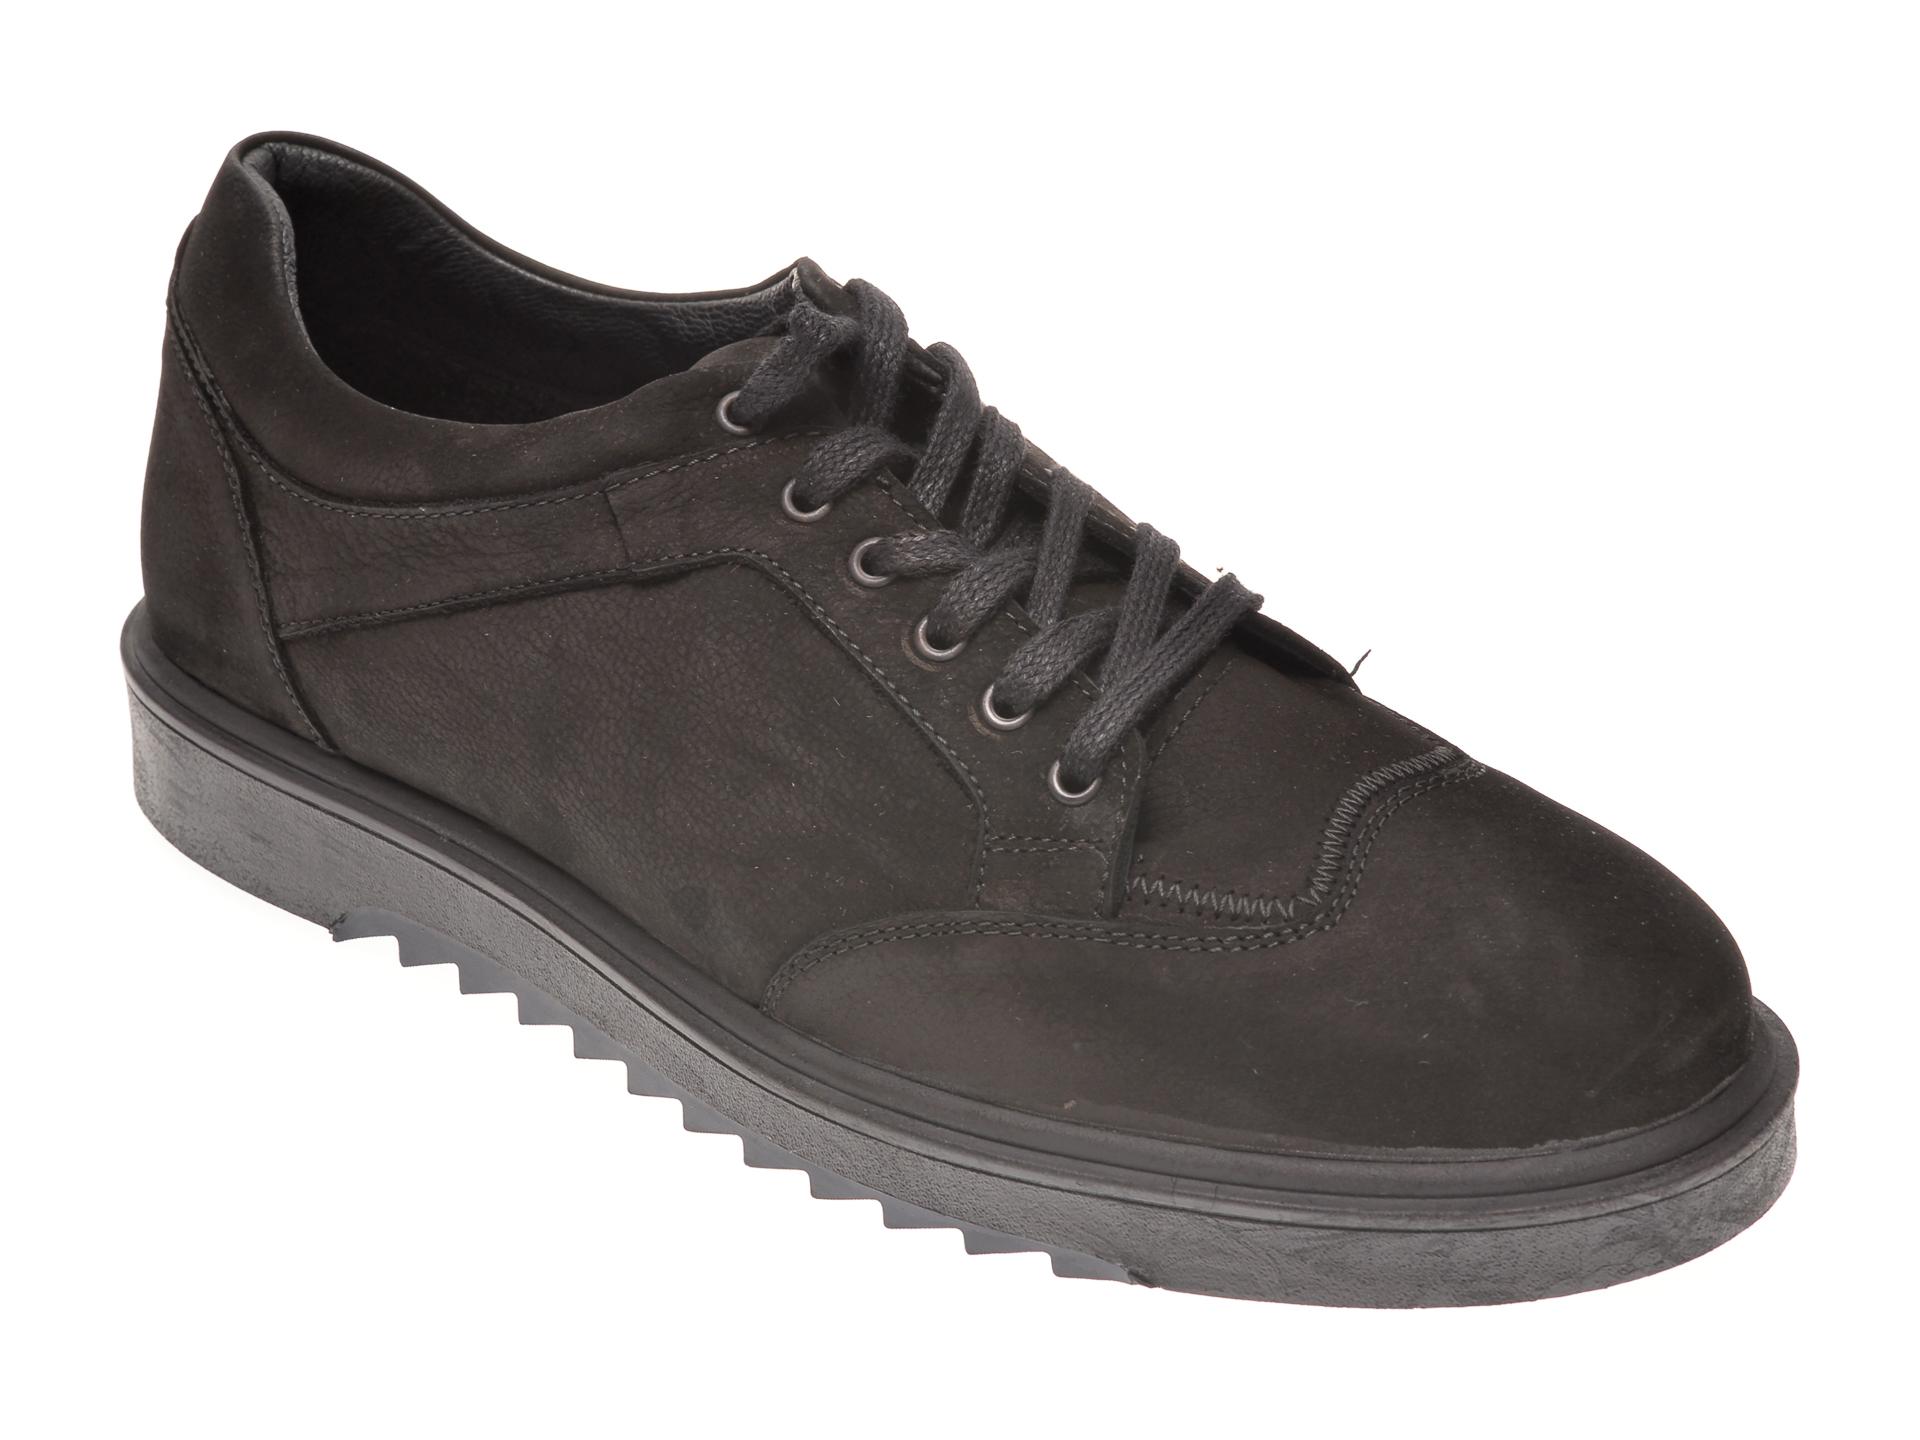 Pantofi OTTER negri, P0312, din nabuc imagine